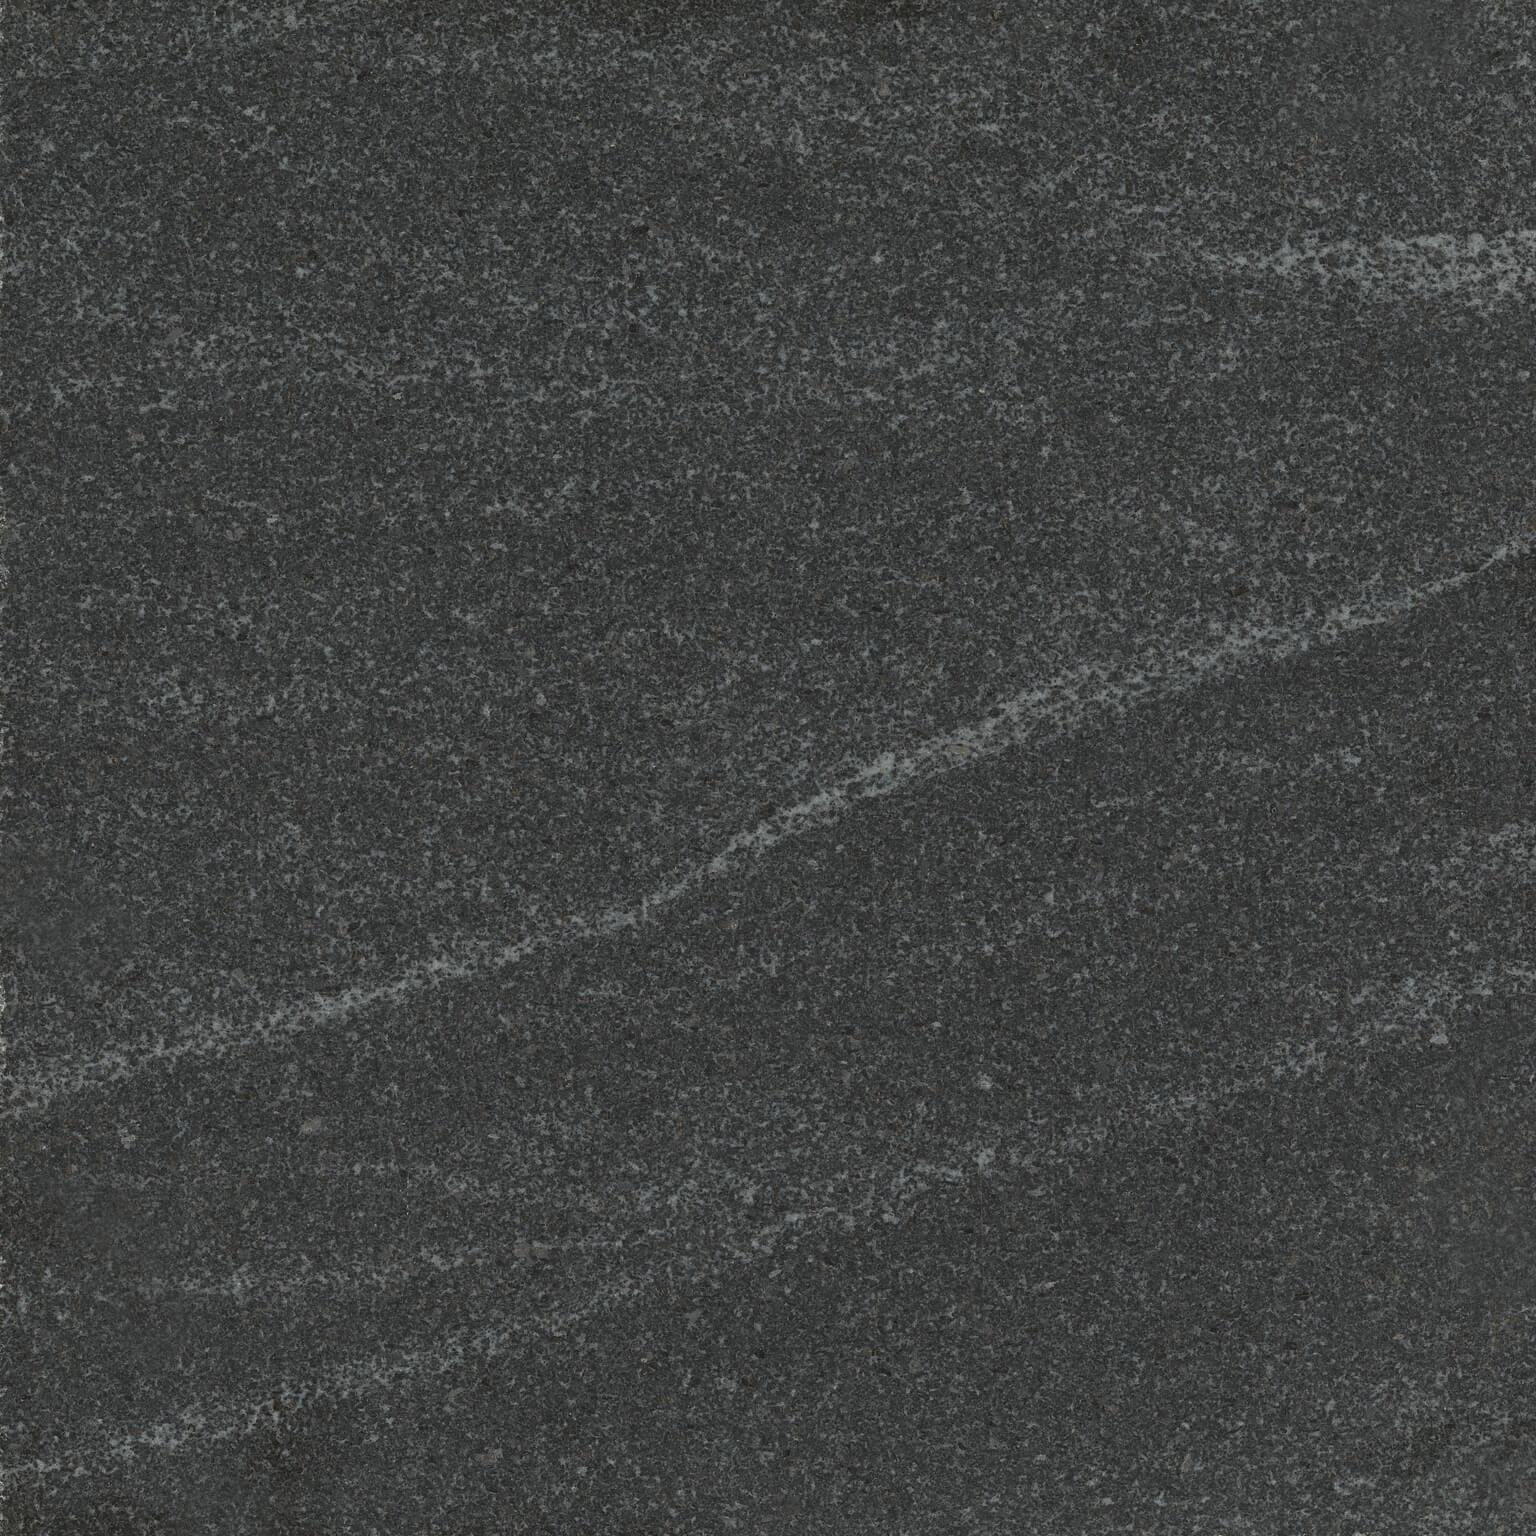 American Black Poli Mat